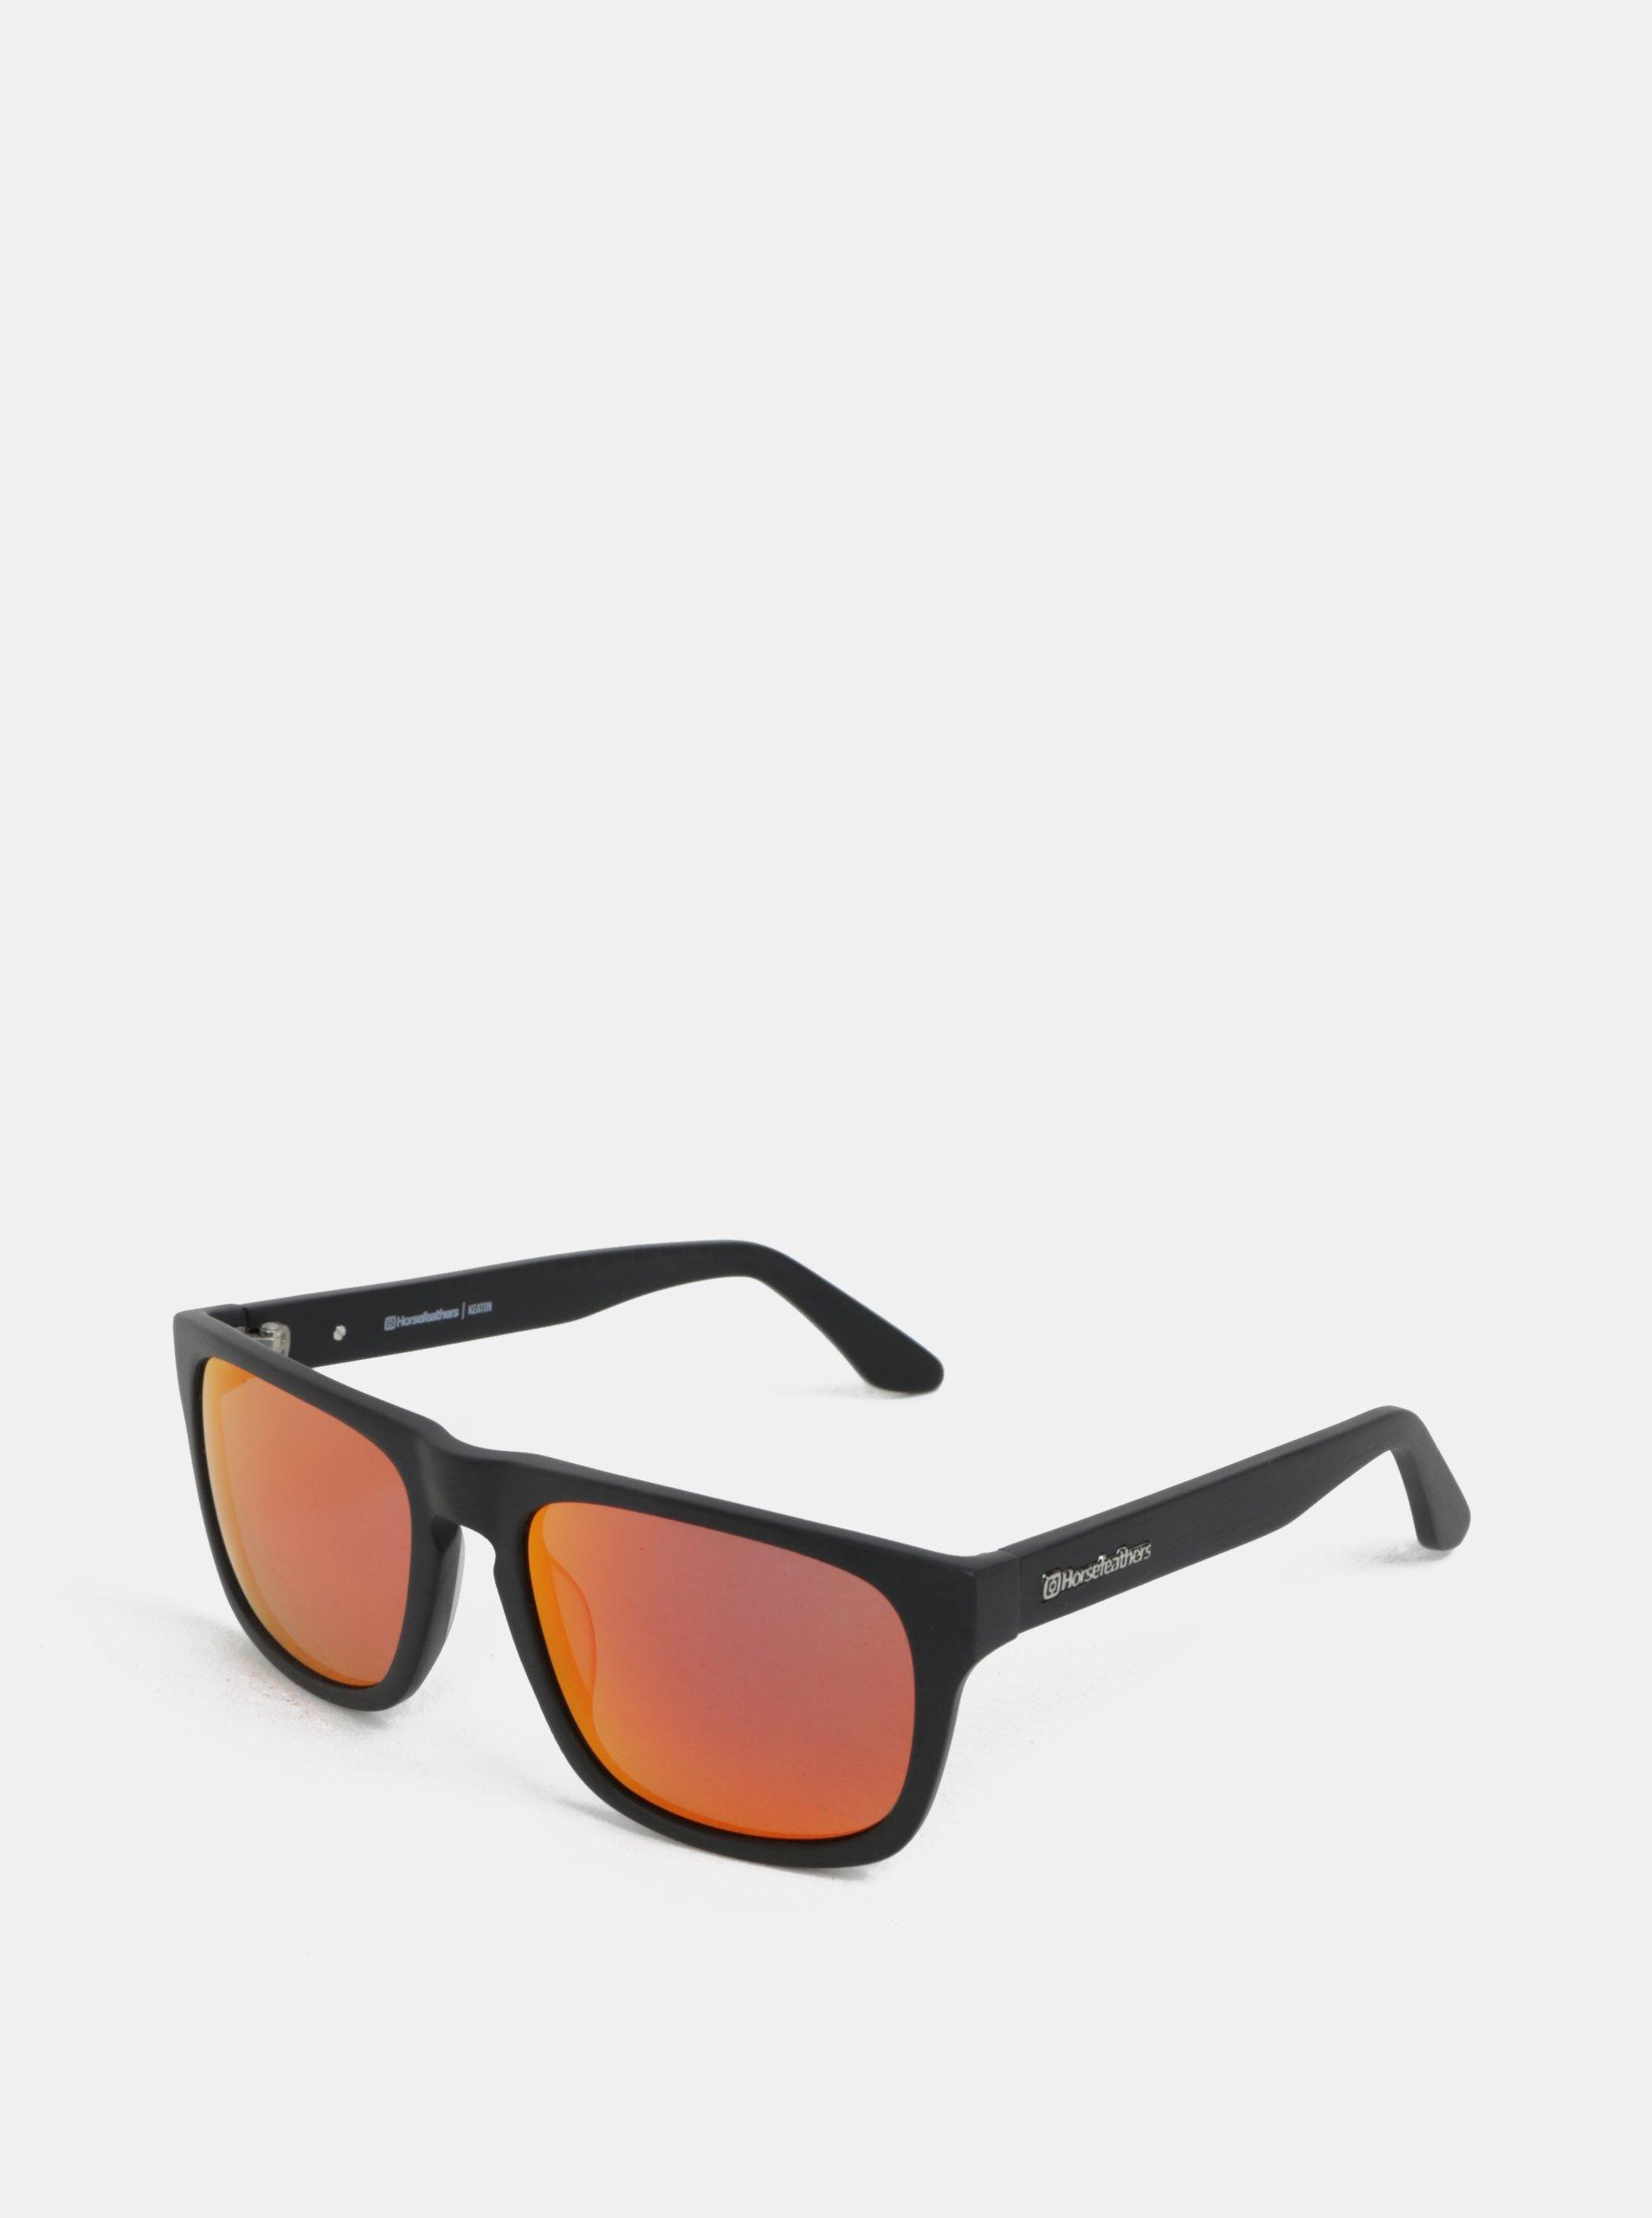 Červeno-čierne pánske slnečné okuliare Horsefeathers Keaton  605ed0552d1